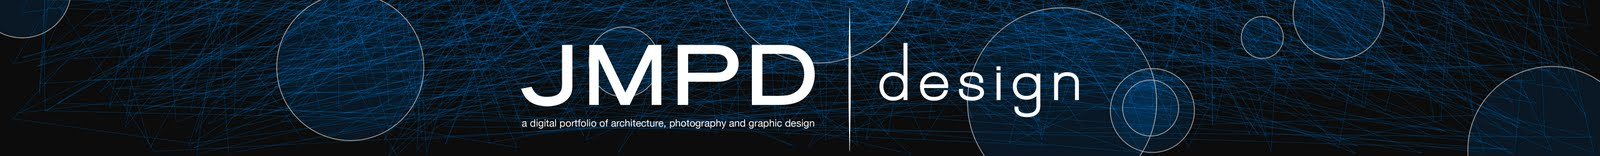 JMPD | design